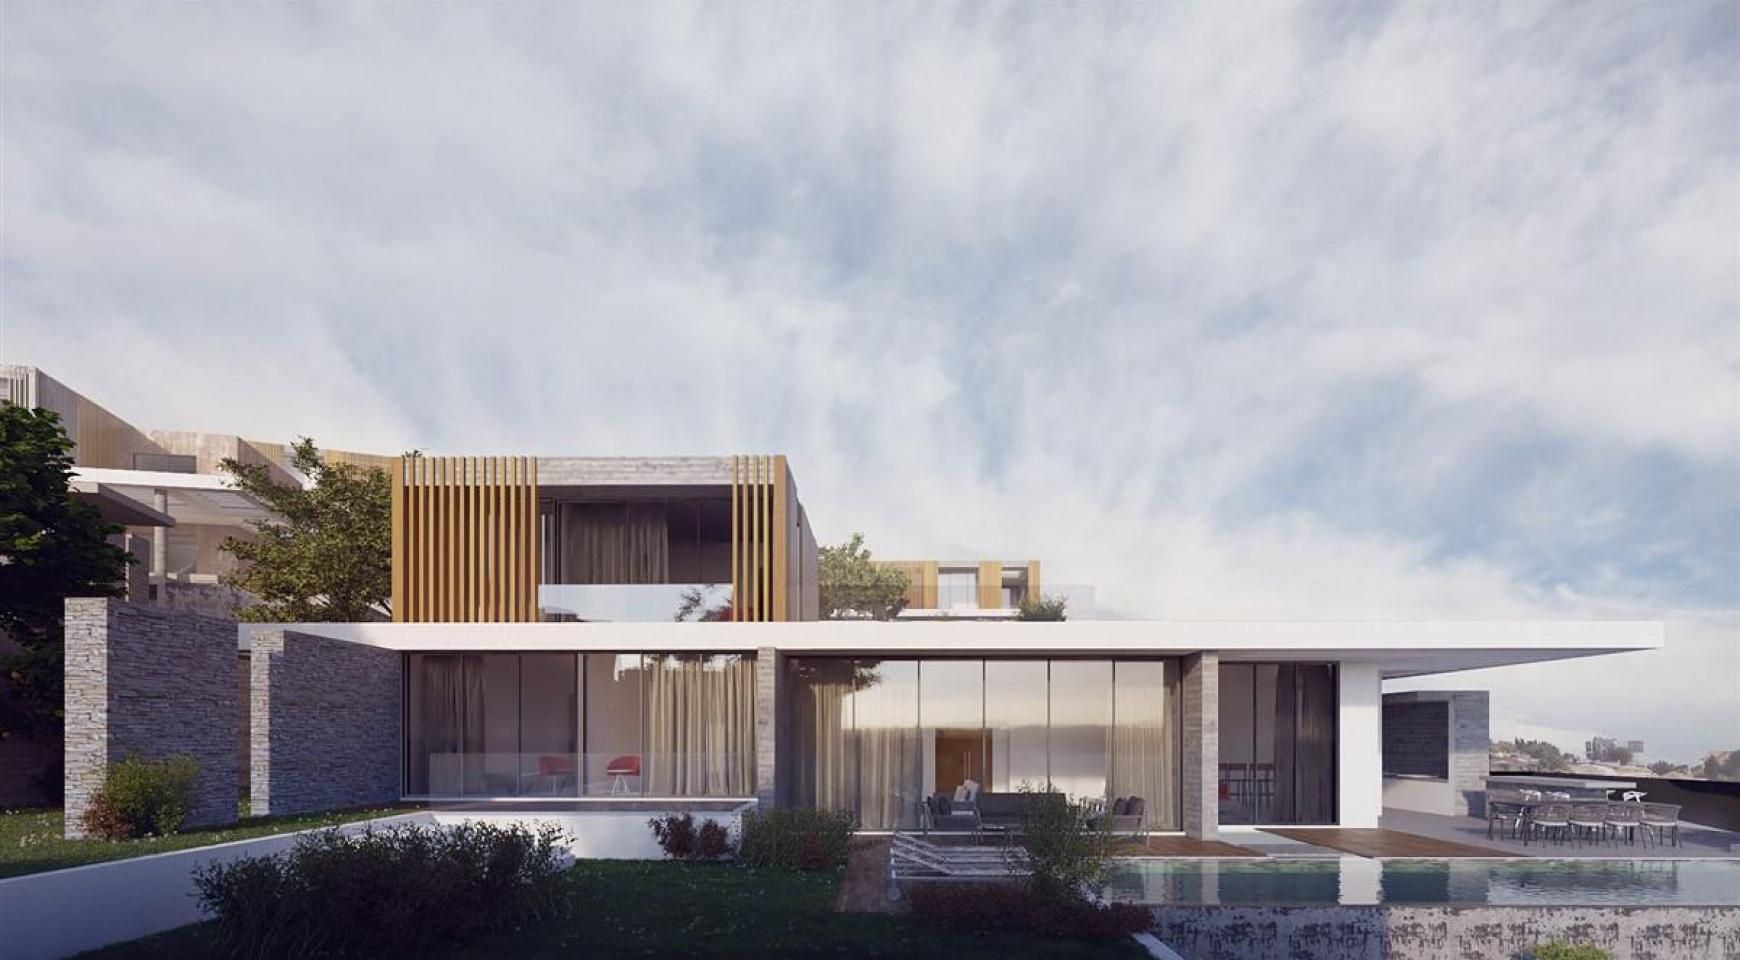 Exclusive 3 Bedroom Villa with Stunning Views in Germasogeia - 1